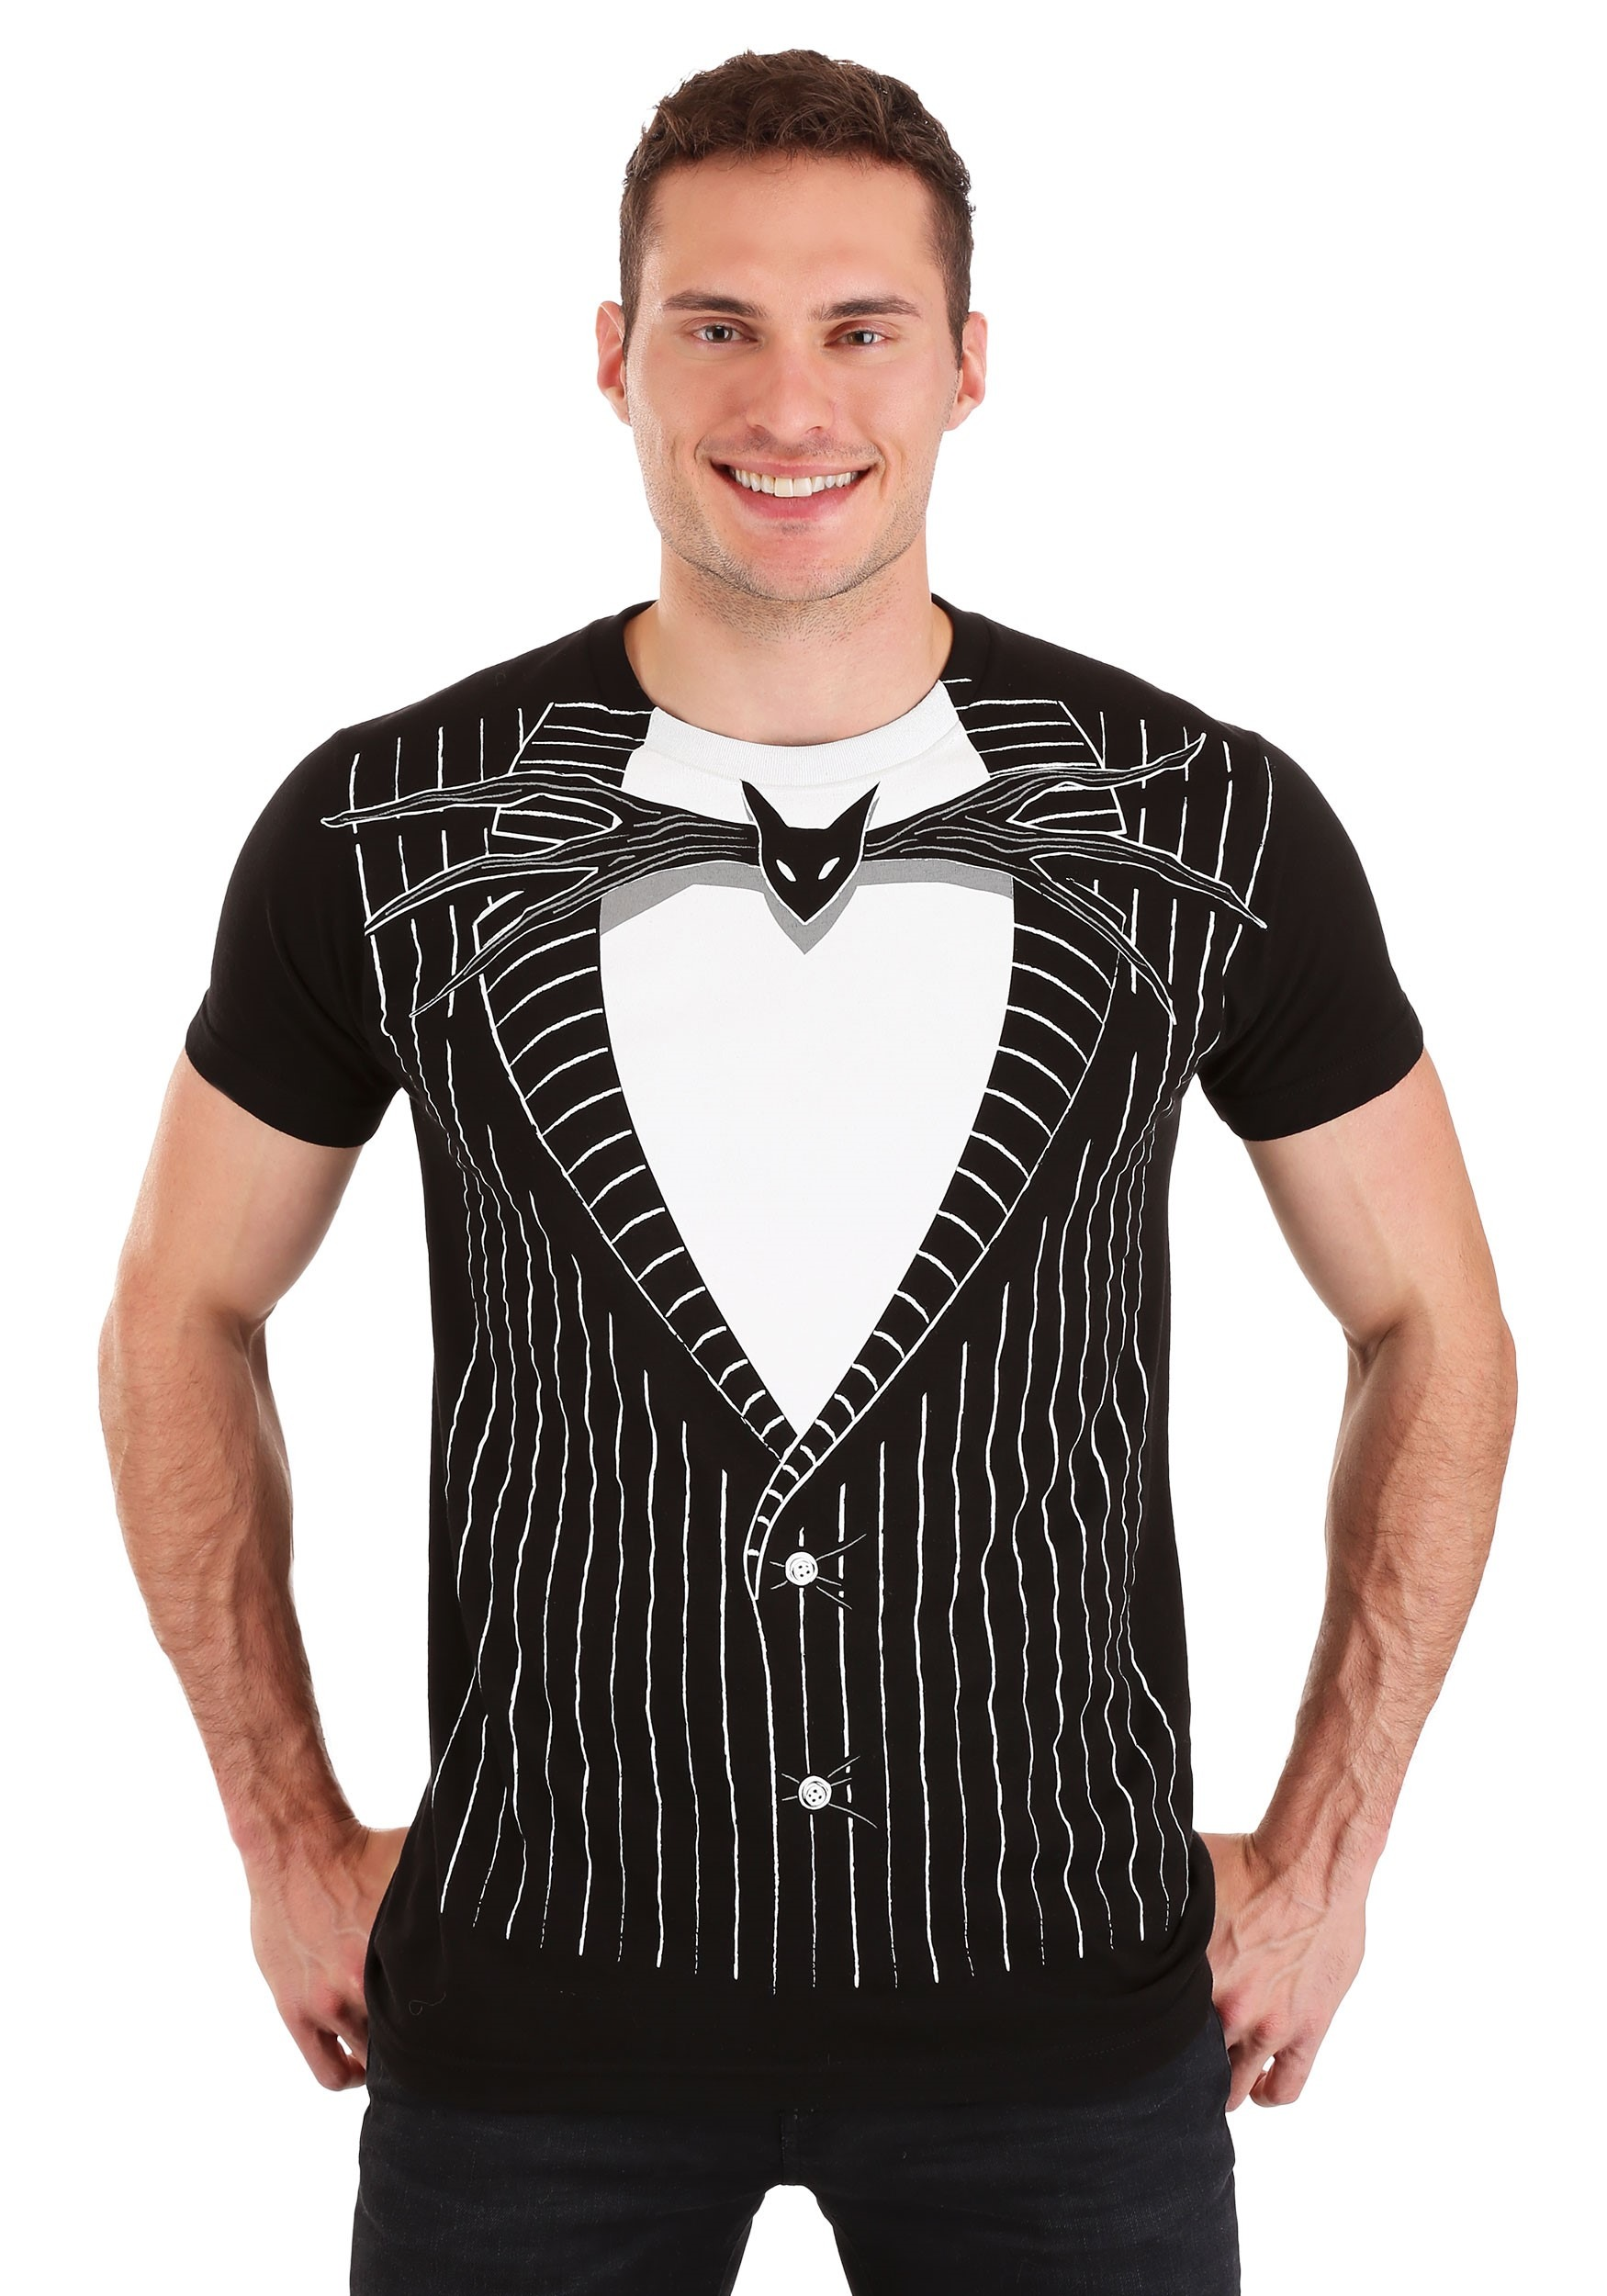 Jack Skellington Costume T-Shirt Nightmare Before Christmas